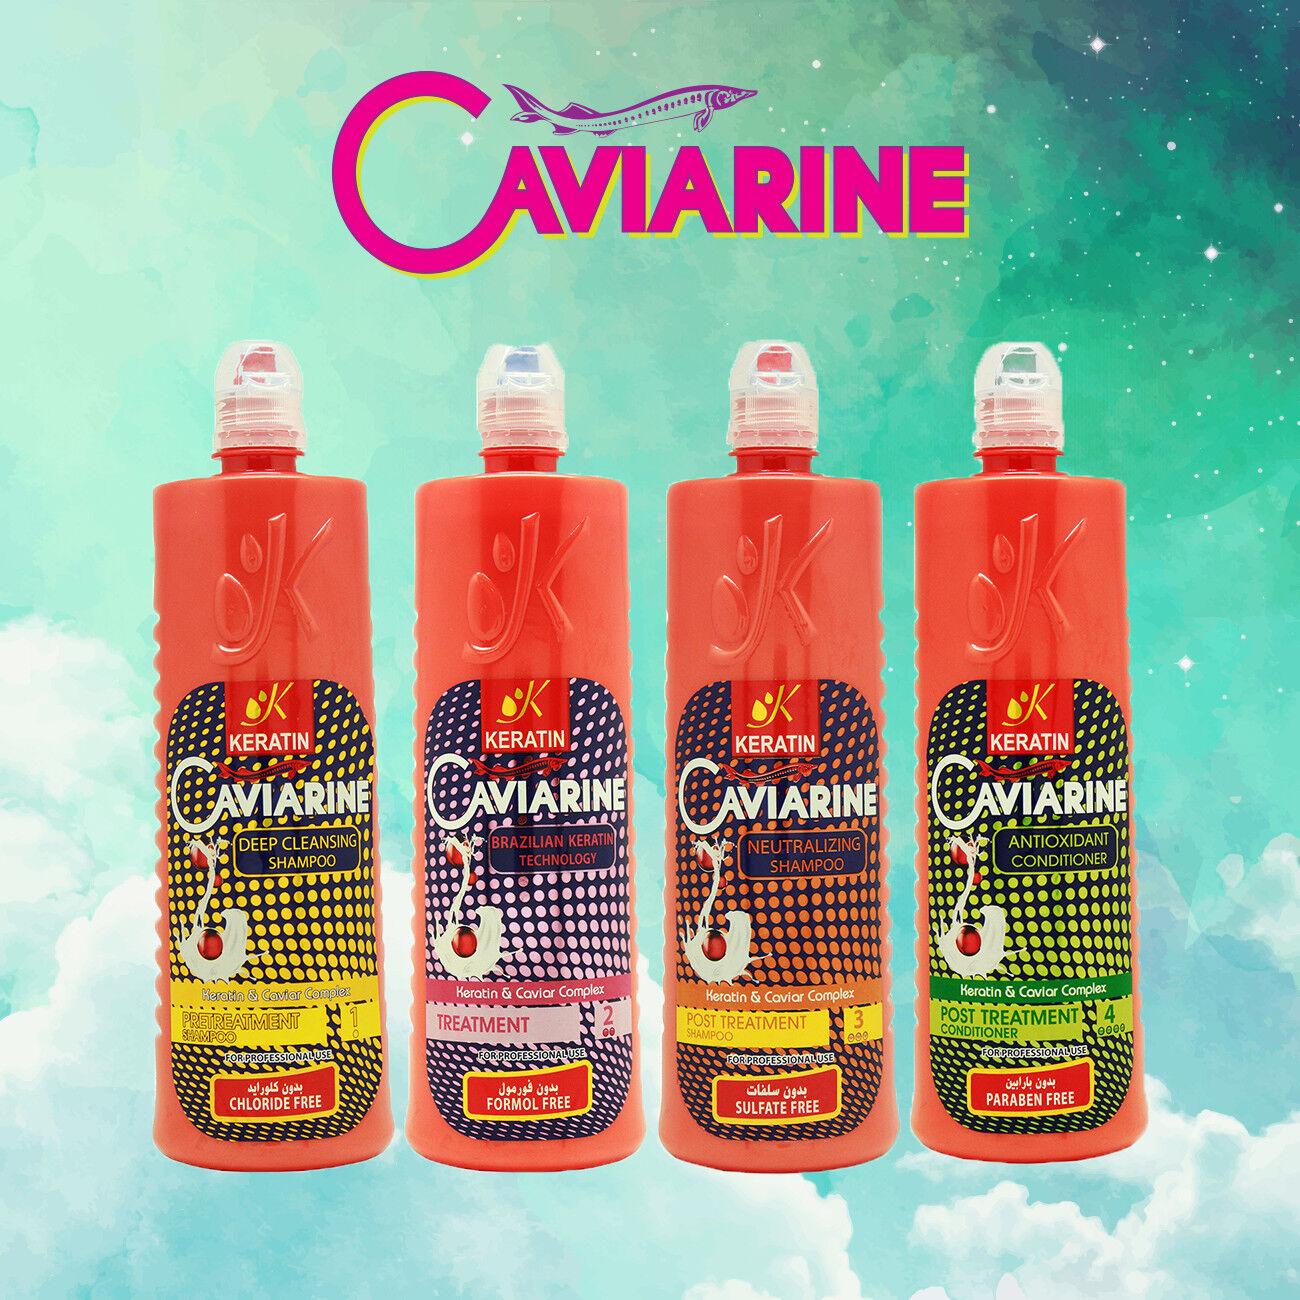 100%Authentic Brazilian Hair Keratin Caviarine Treatment Saf